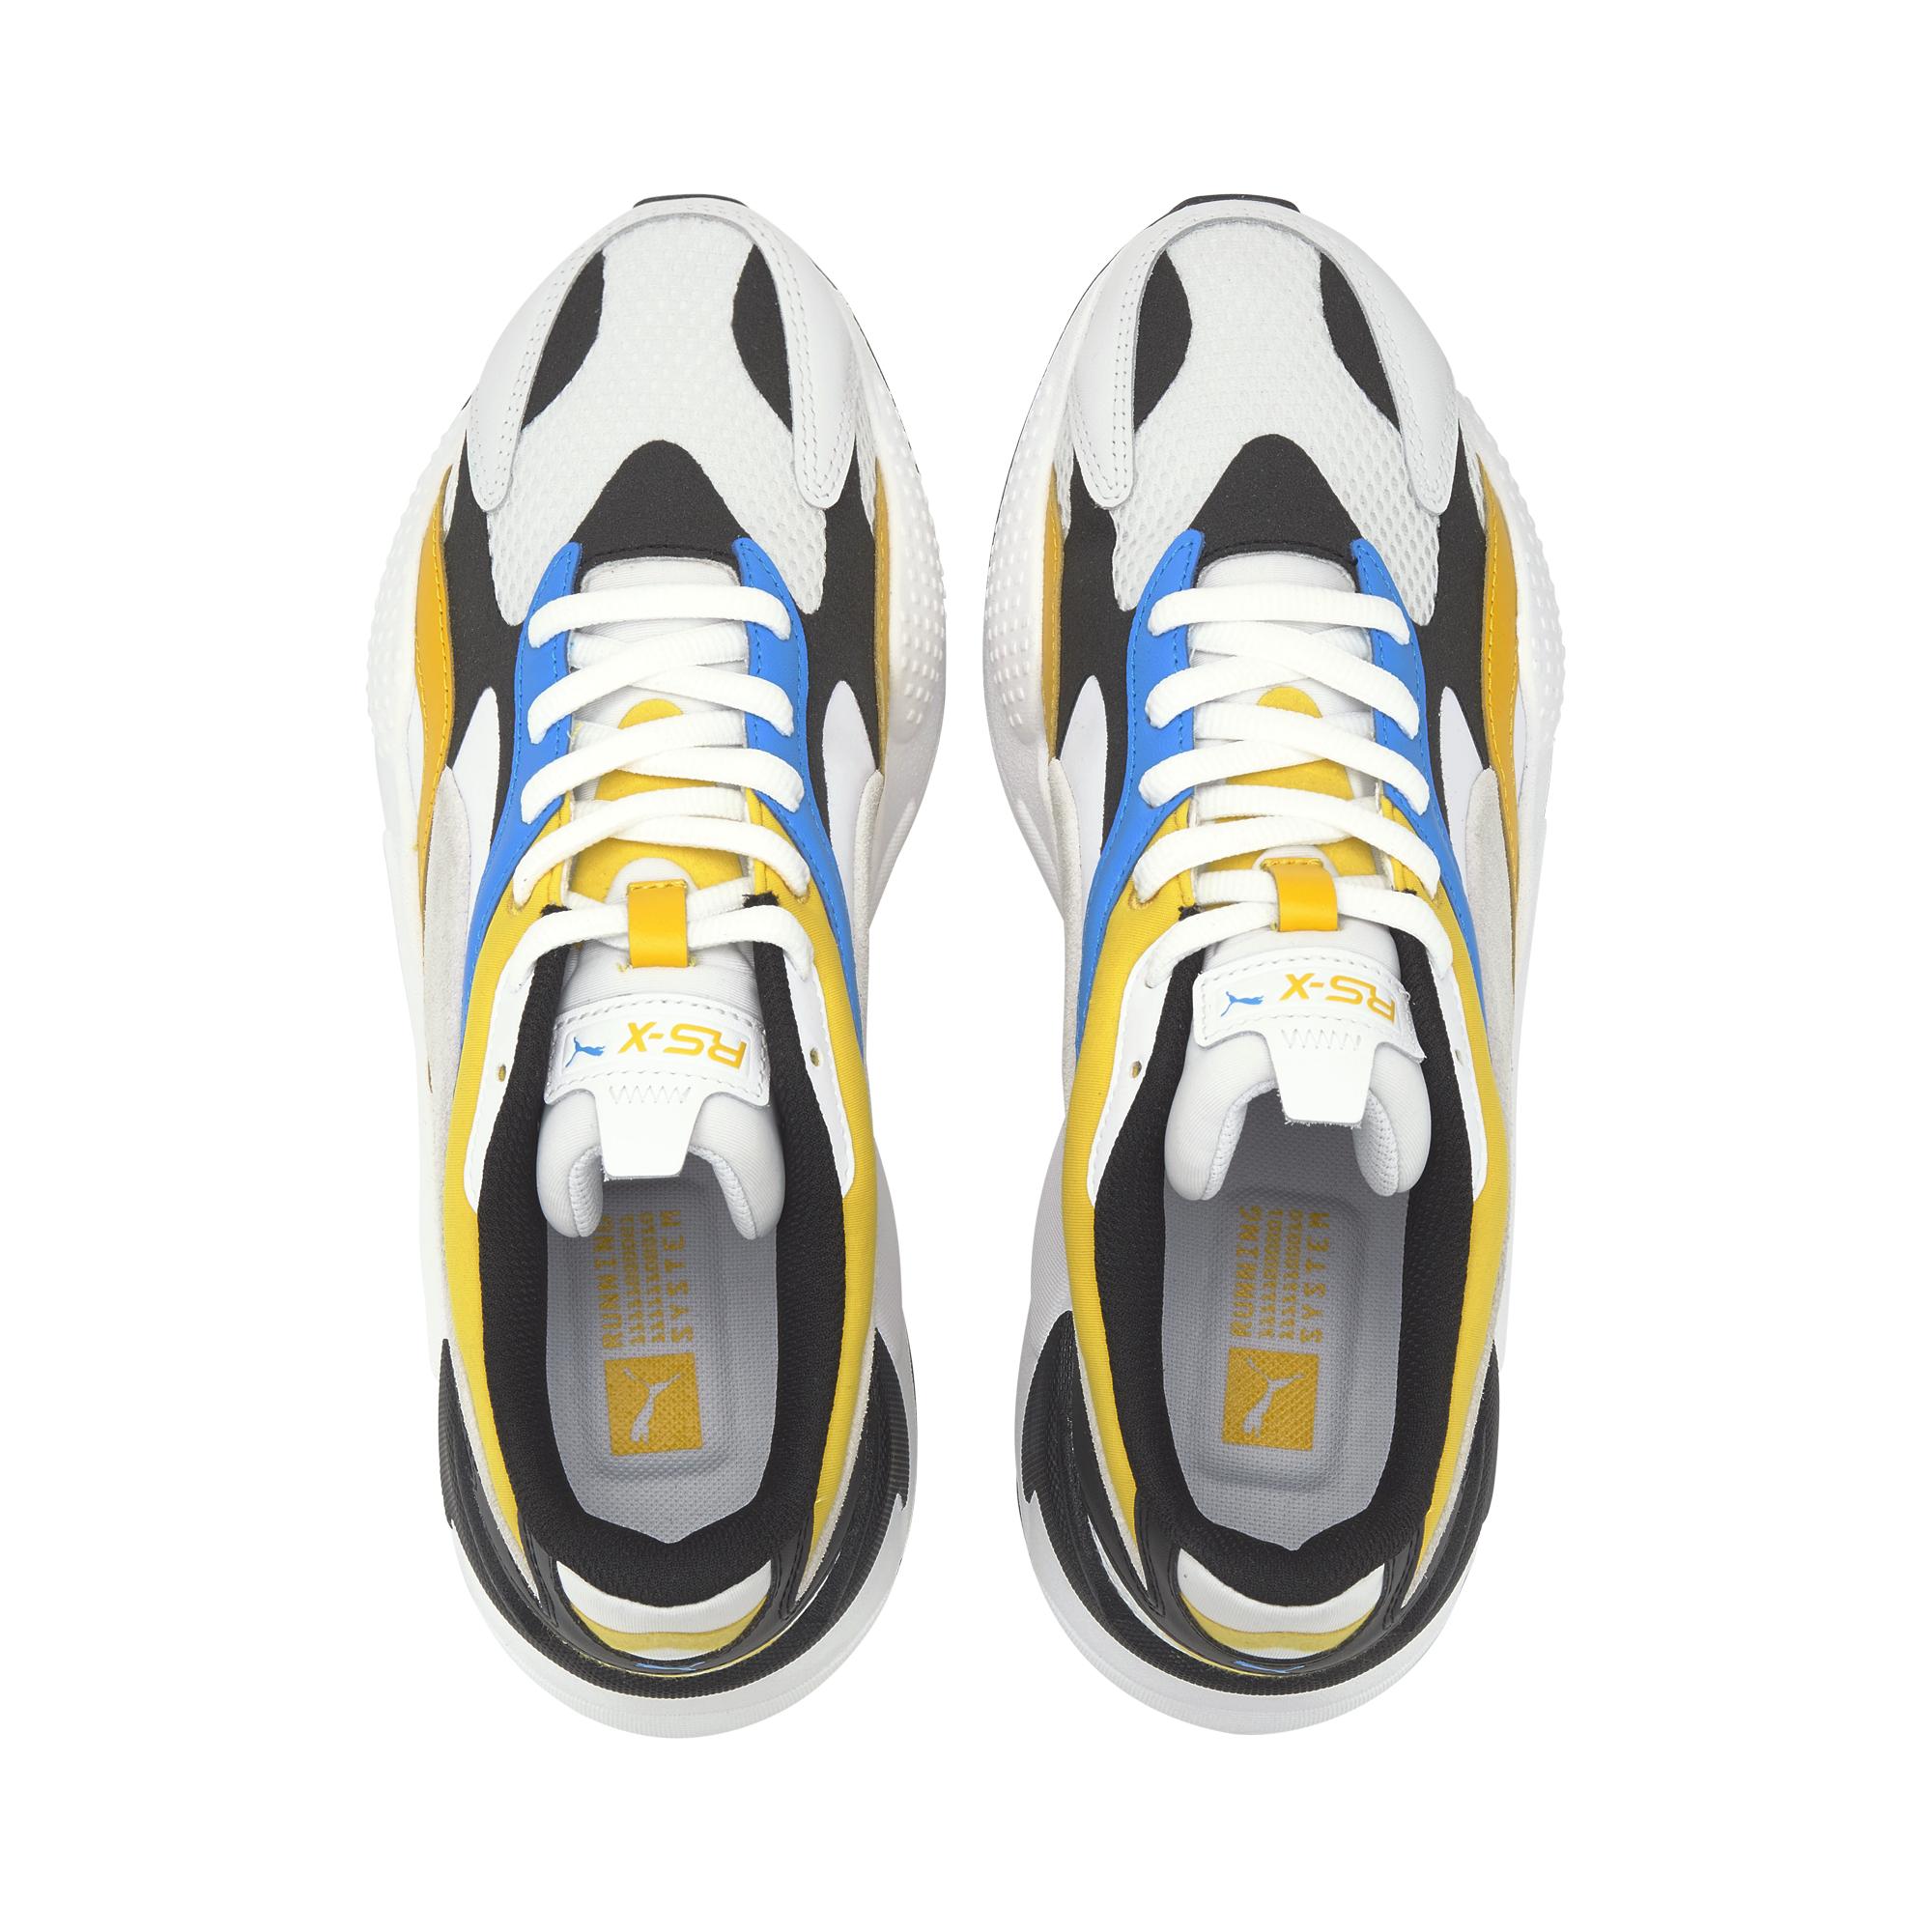 Puma RS-X3 sneakers, white/yellow, 43